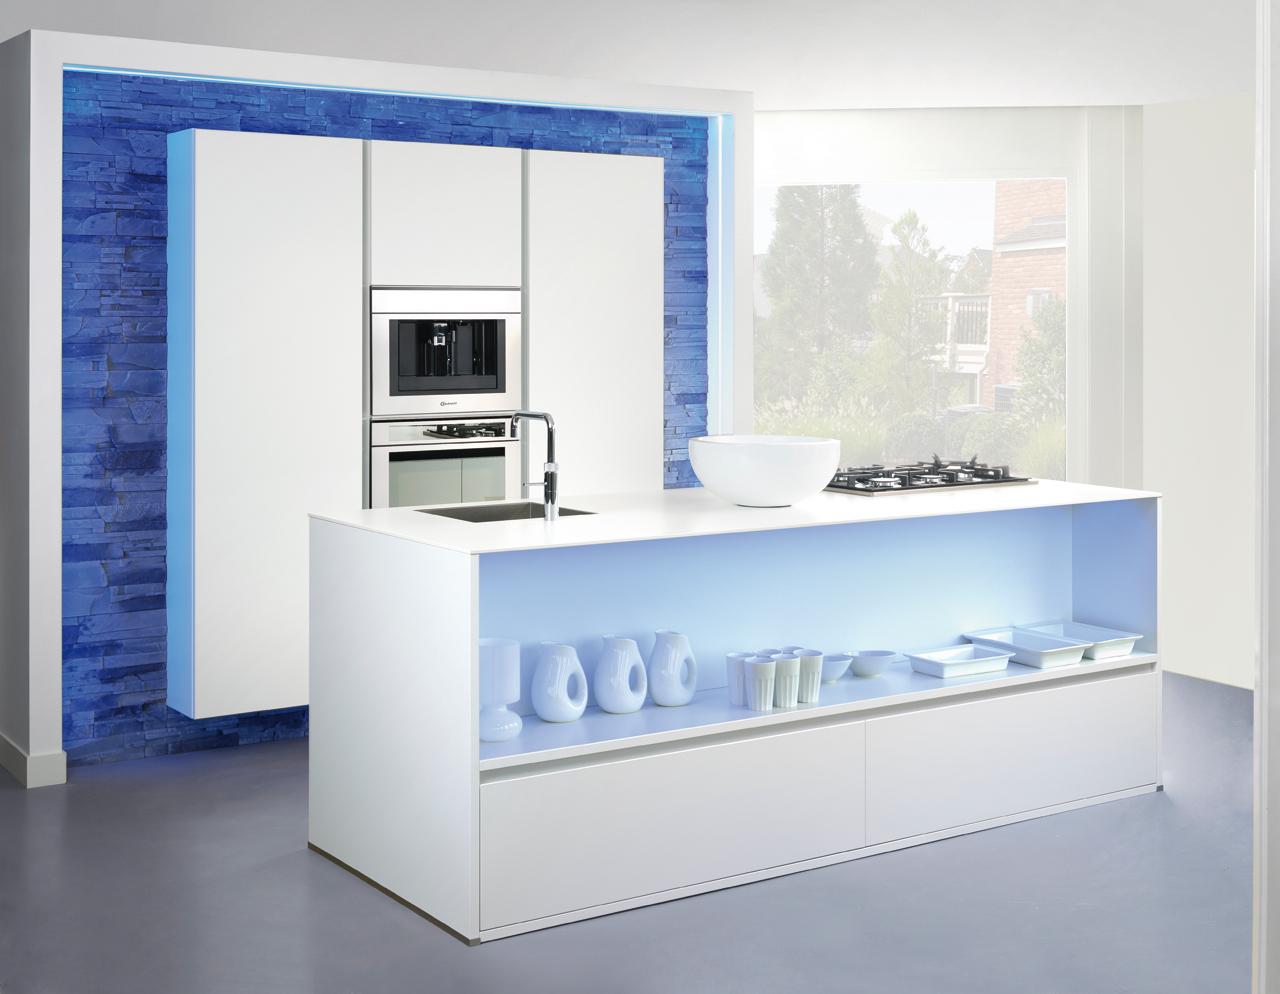 Glazen Achterwand Keuken Zaandam : Moderne keukens Grando Keukens & Bad Zaandam